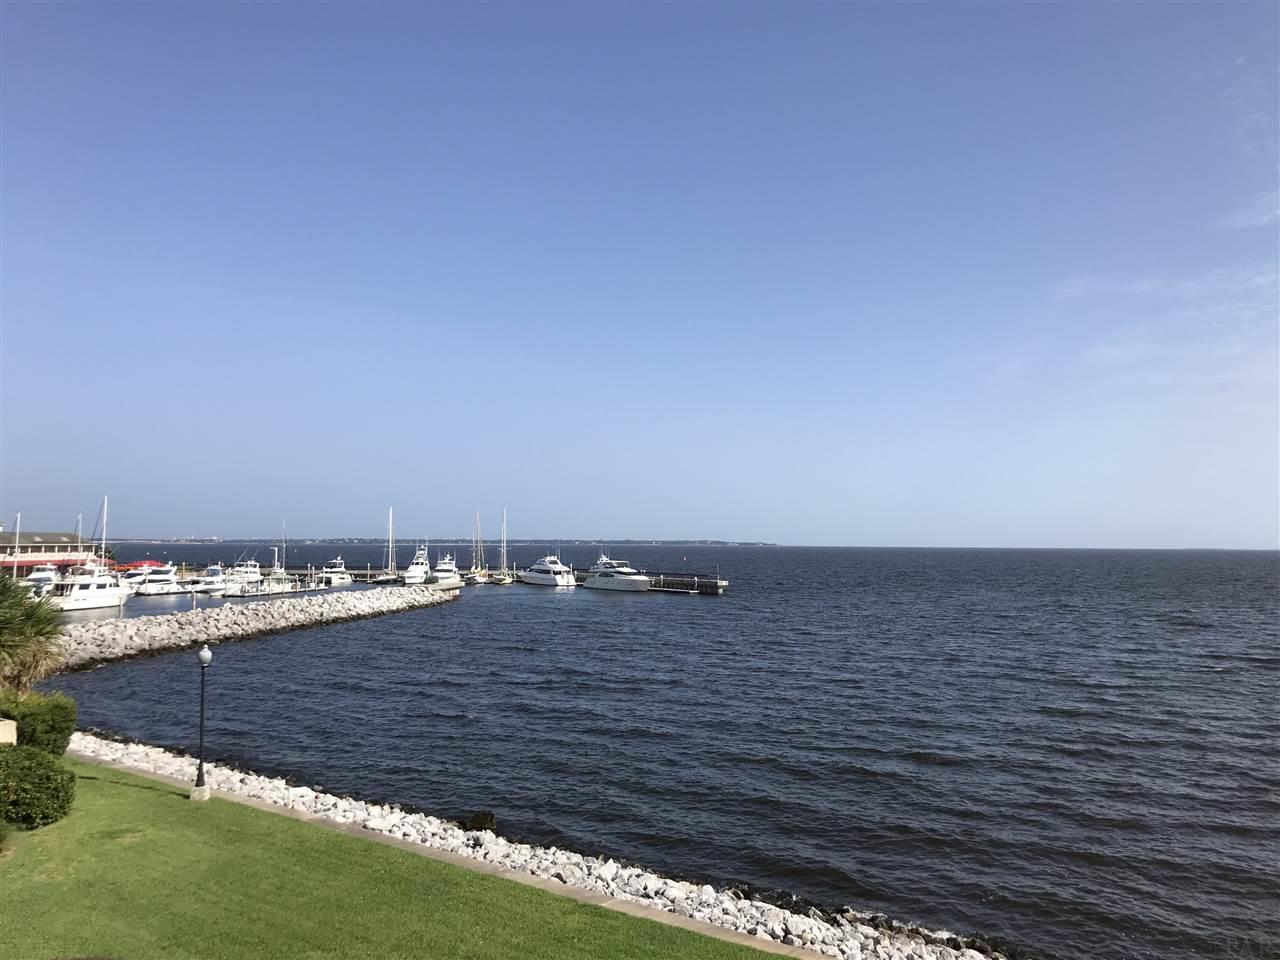 305 Port Royal Way, Pensacola, FL 32502